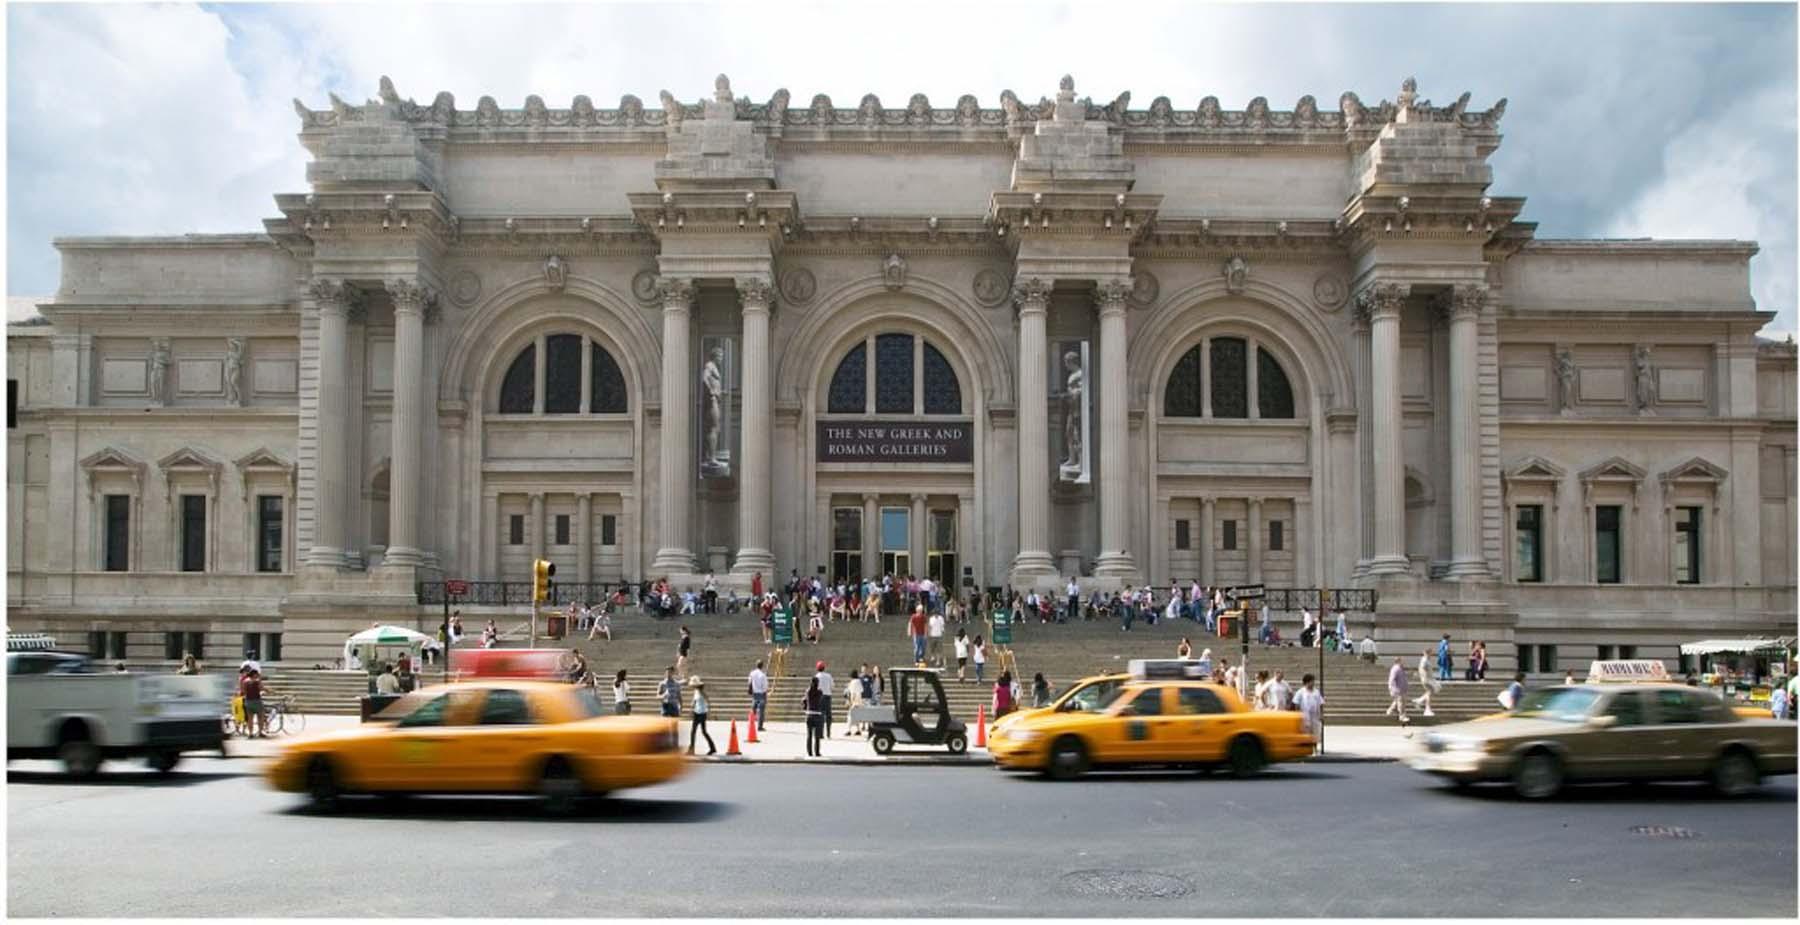 ocio-alternativo-viajes-museo-metropolitano-arte-nueva-yourk-espiritualmente-1-1024x526